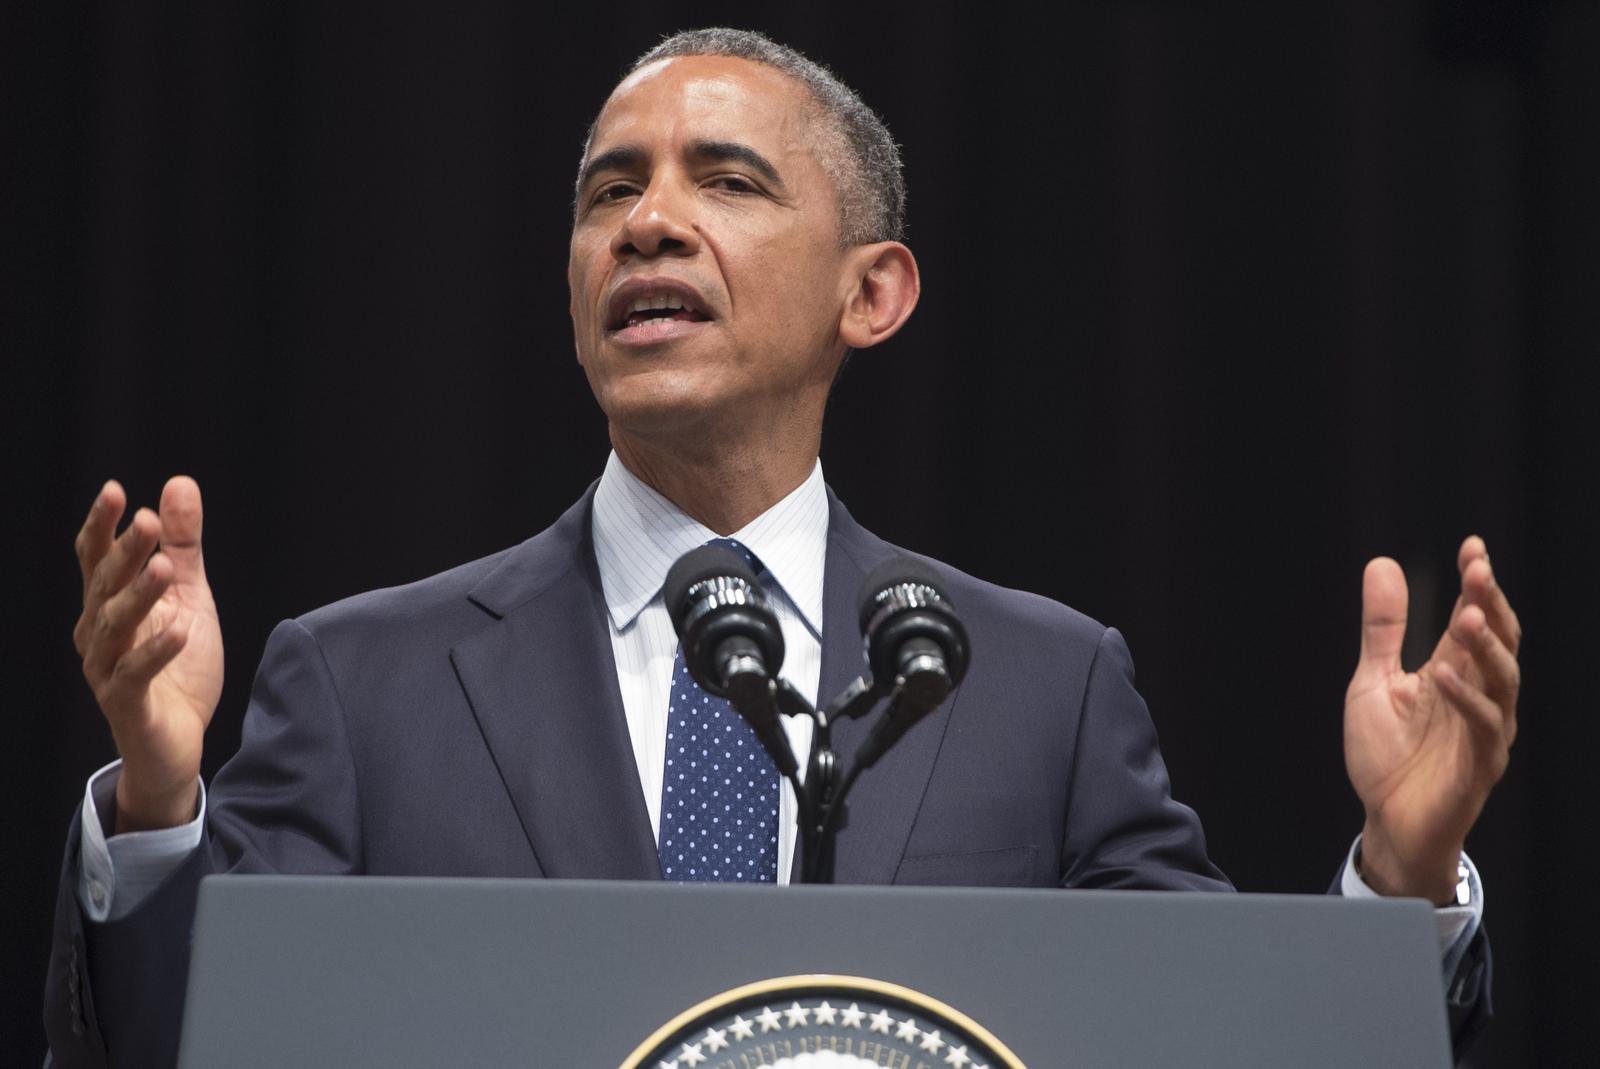 president barack obama speaks - HD2822×1885